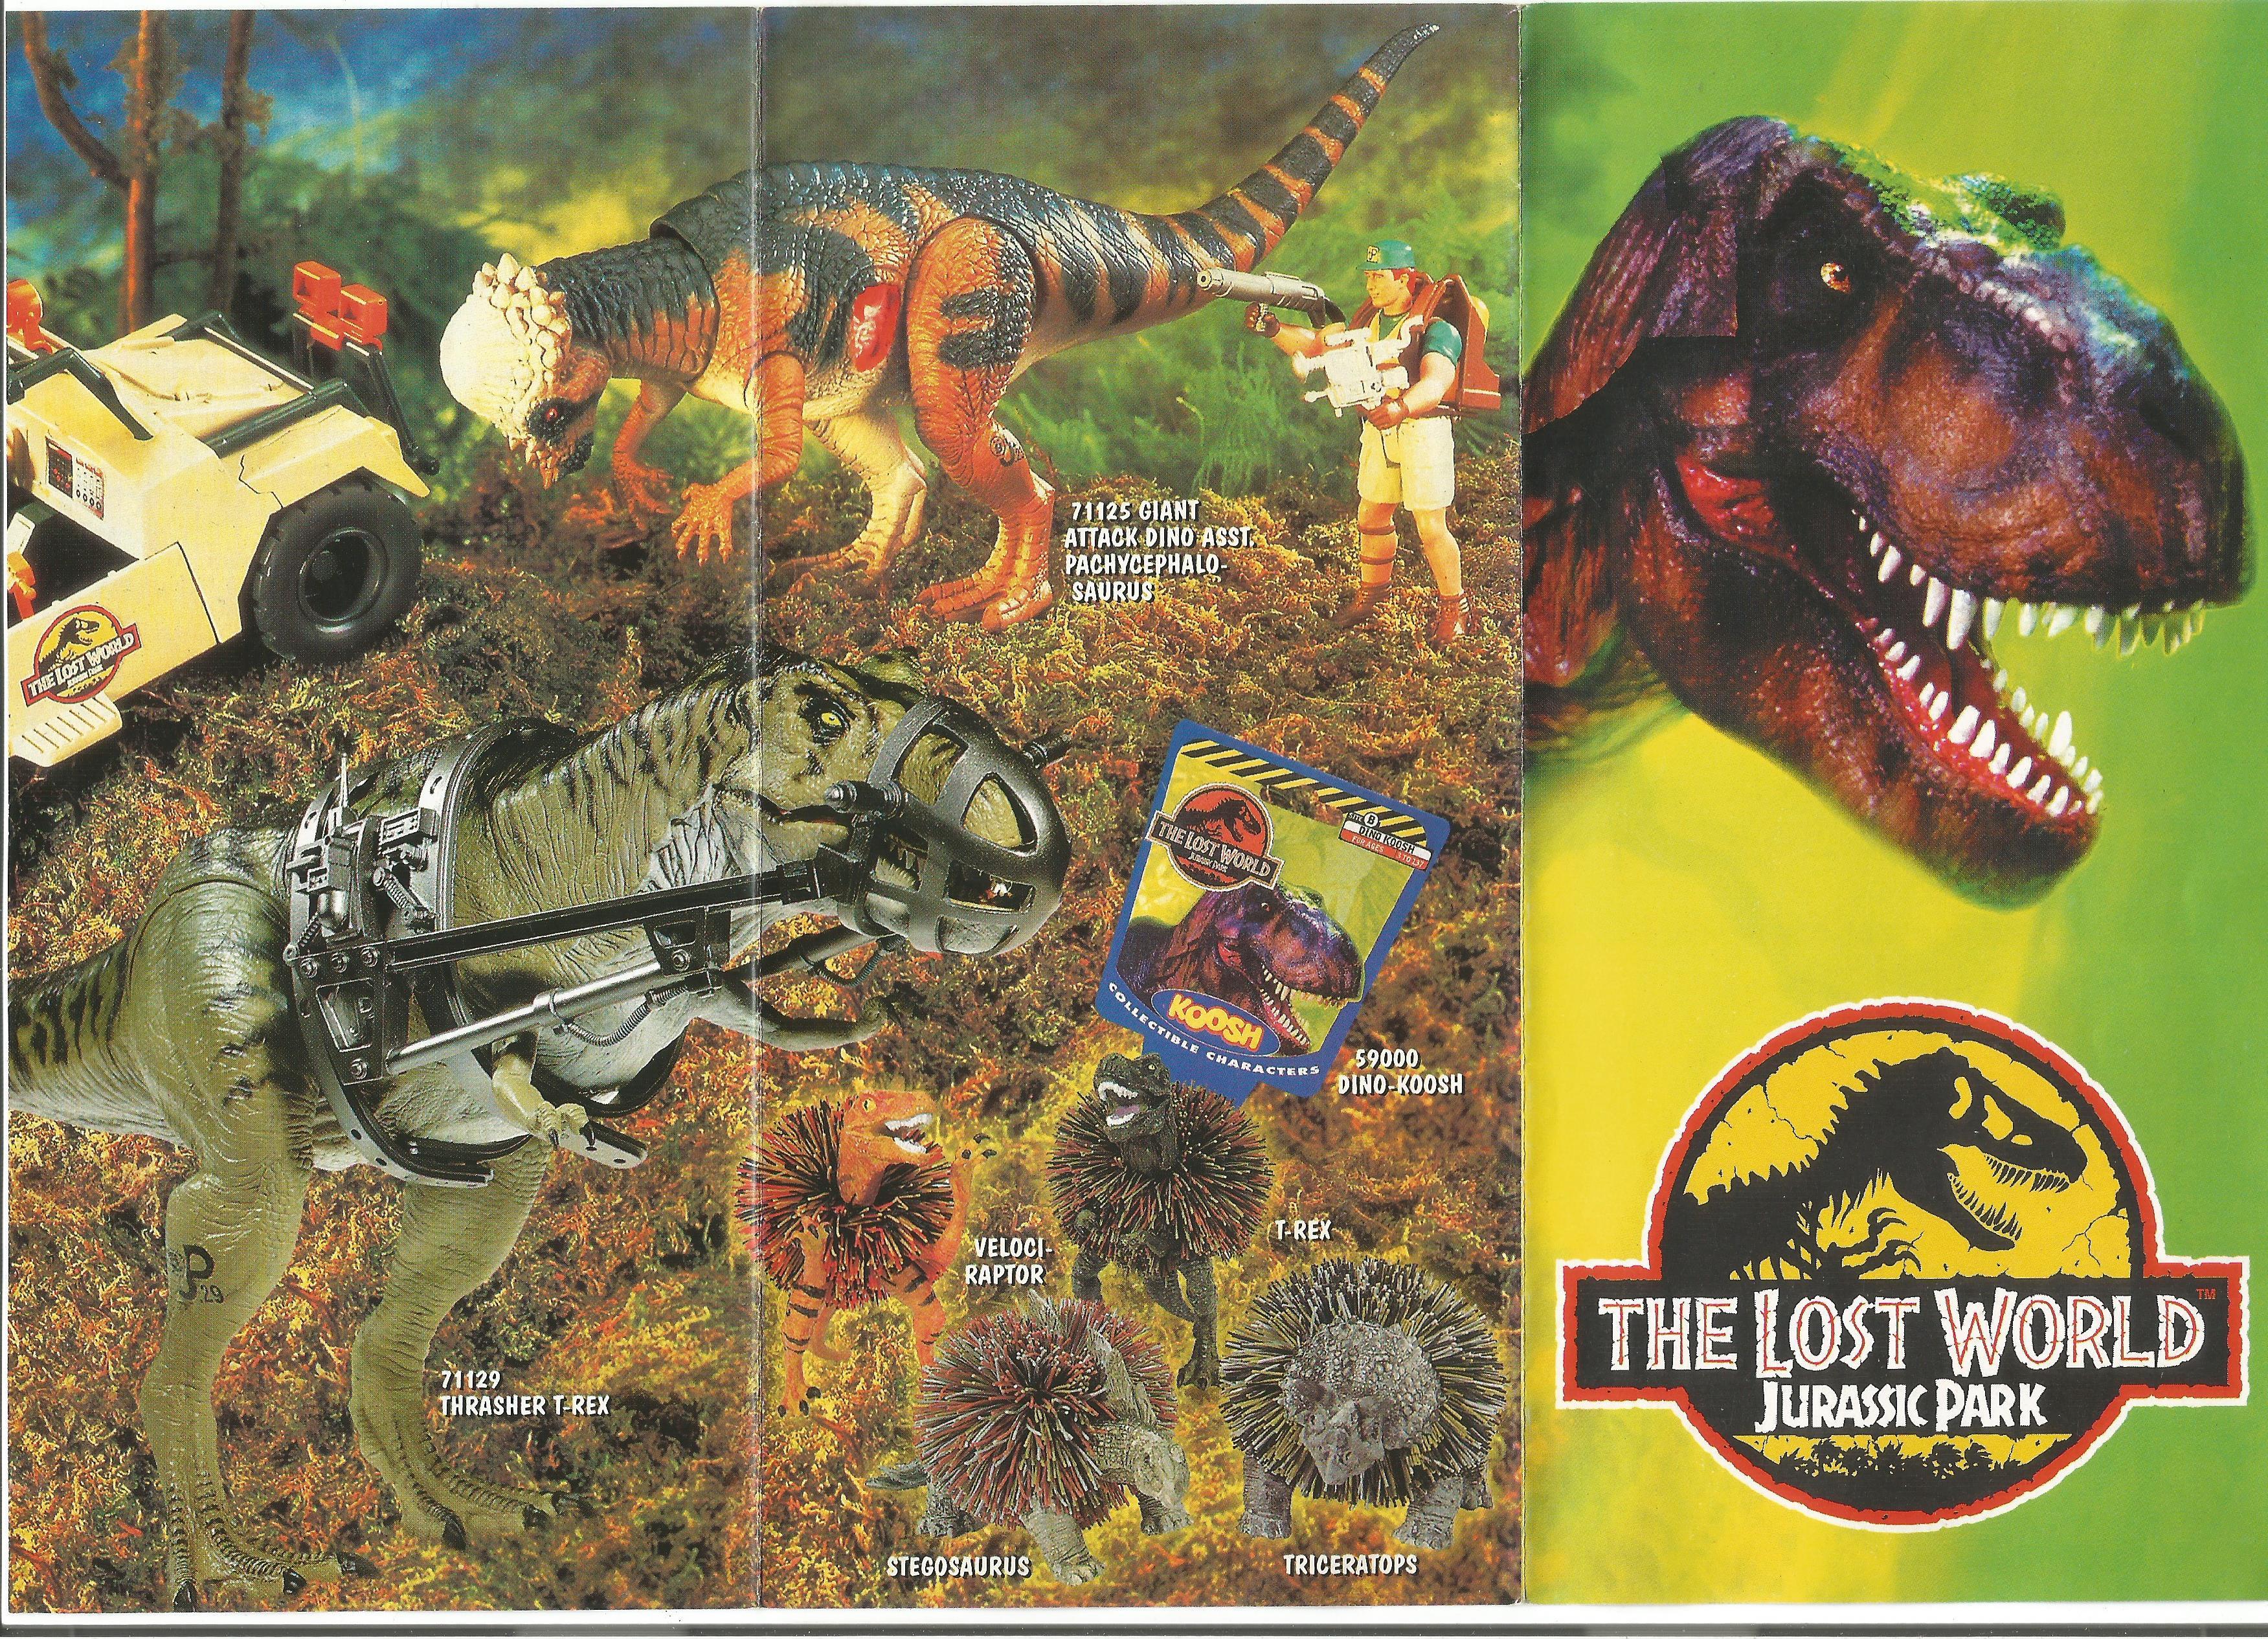 Lost World Jurassic Park egylapos katalógus